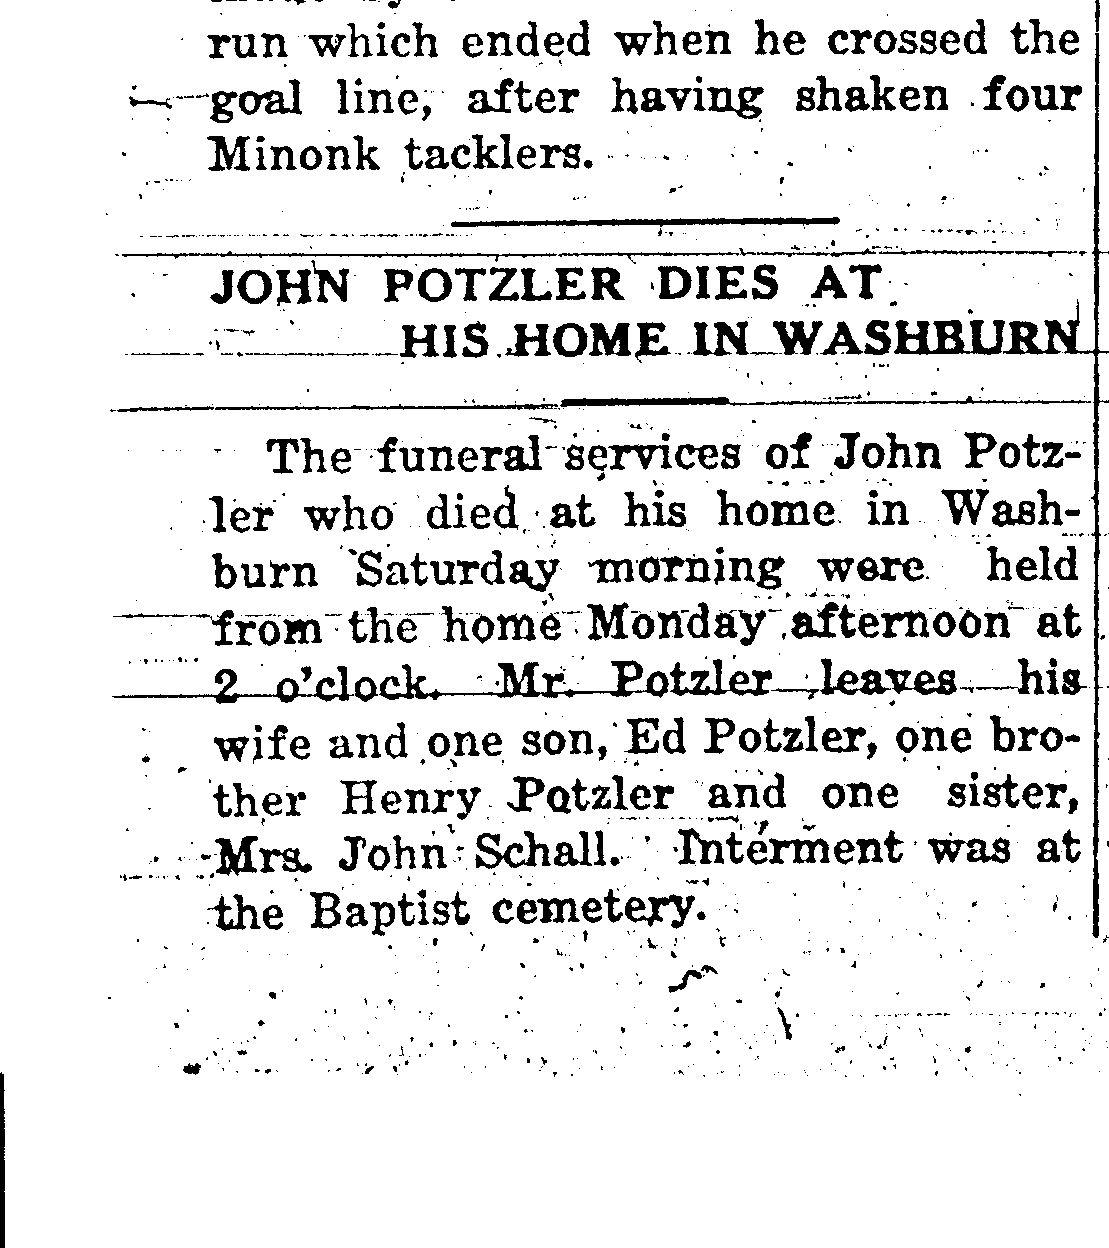 John Potzler